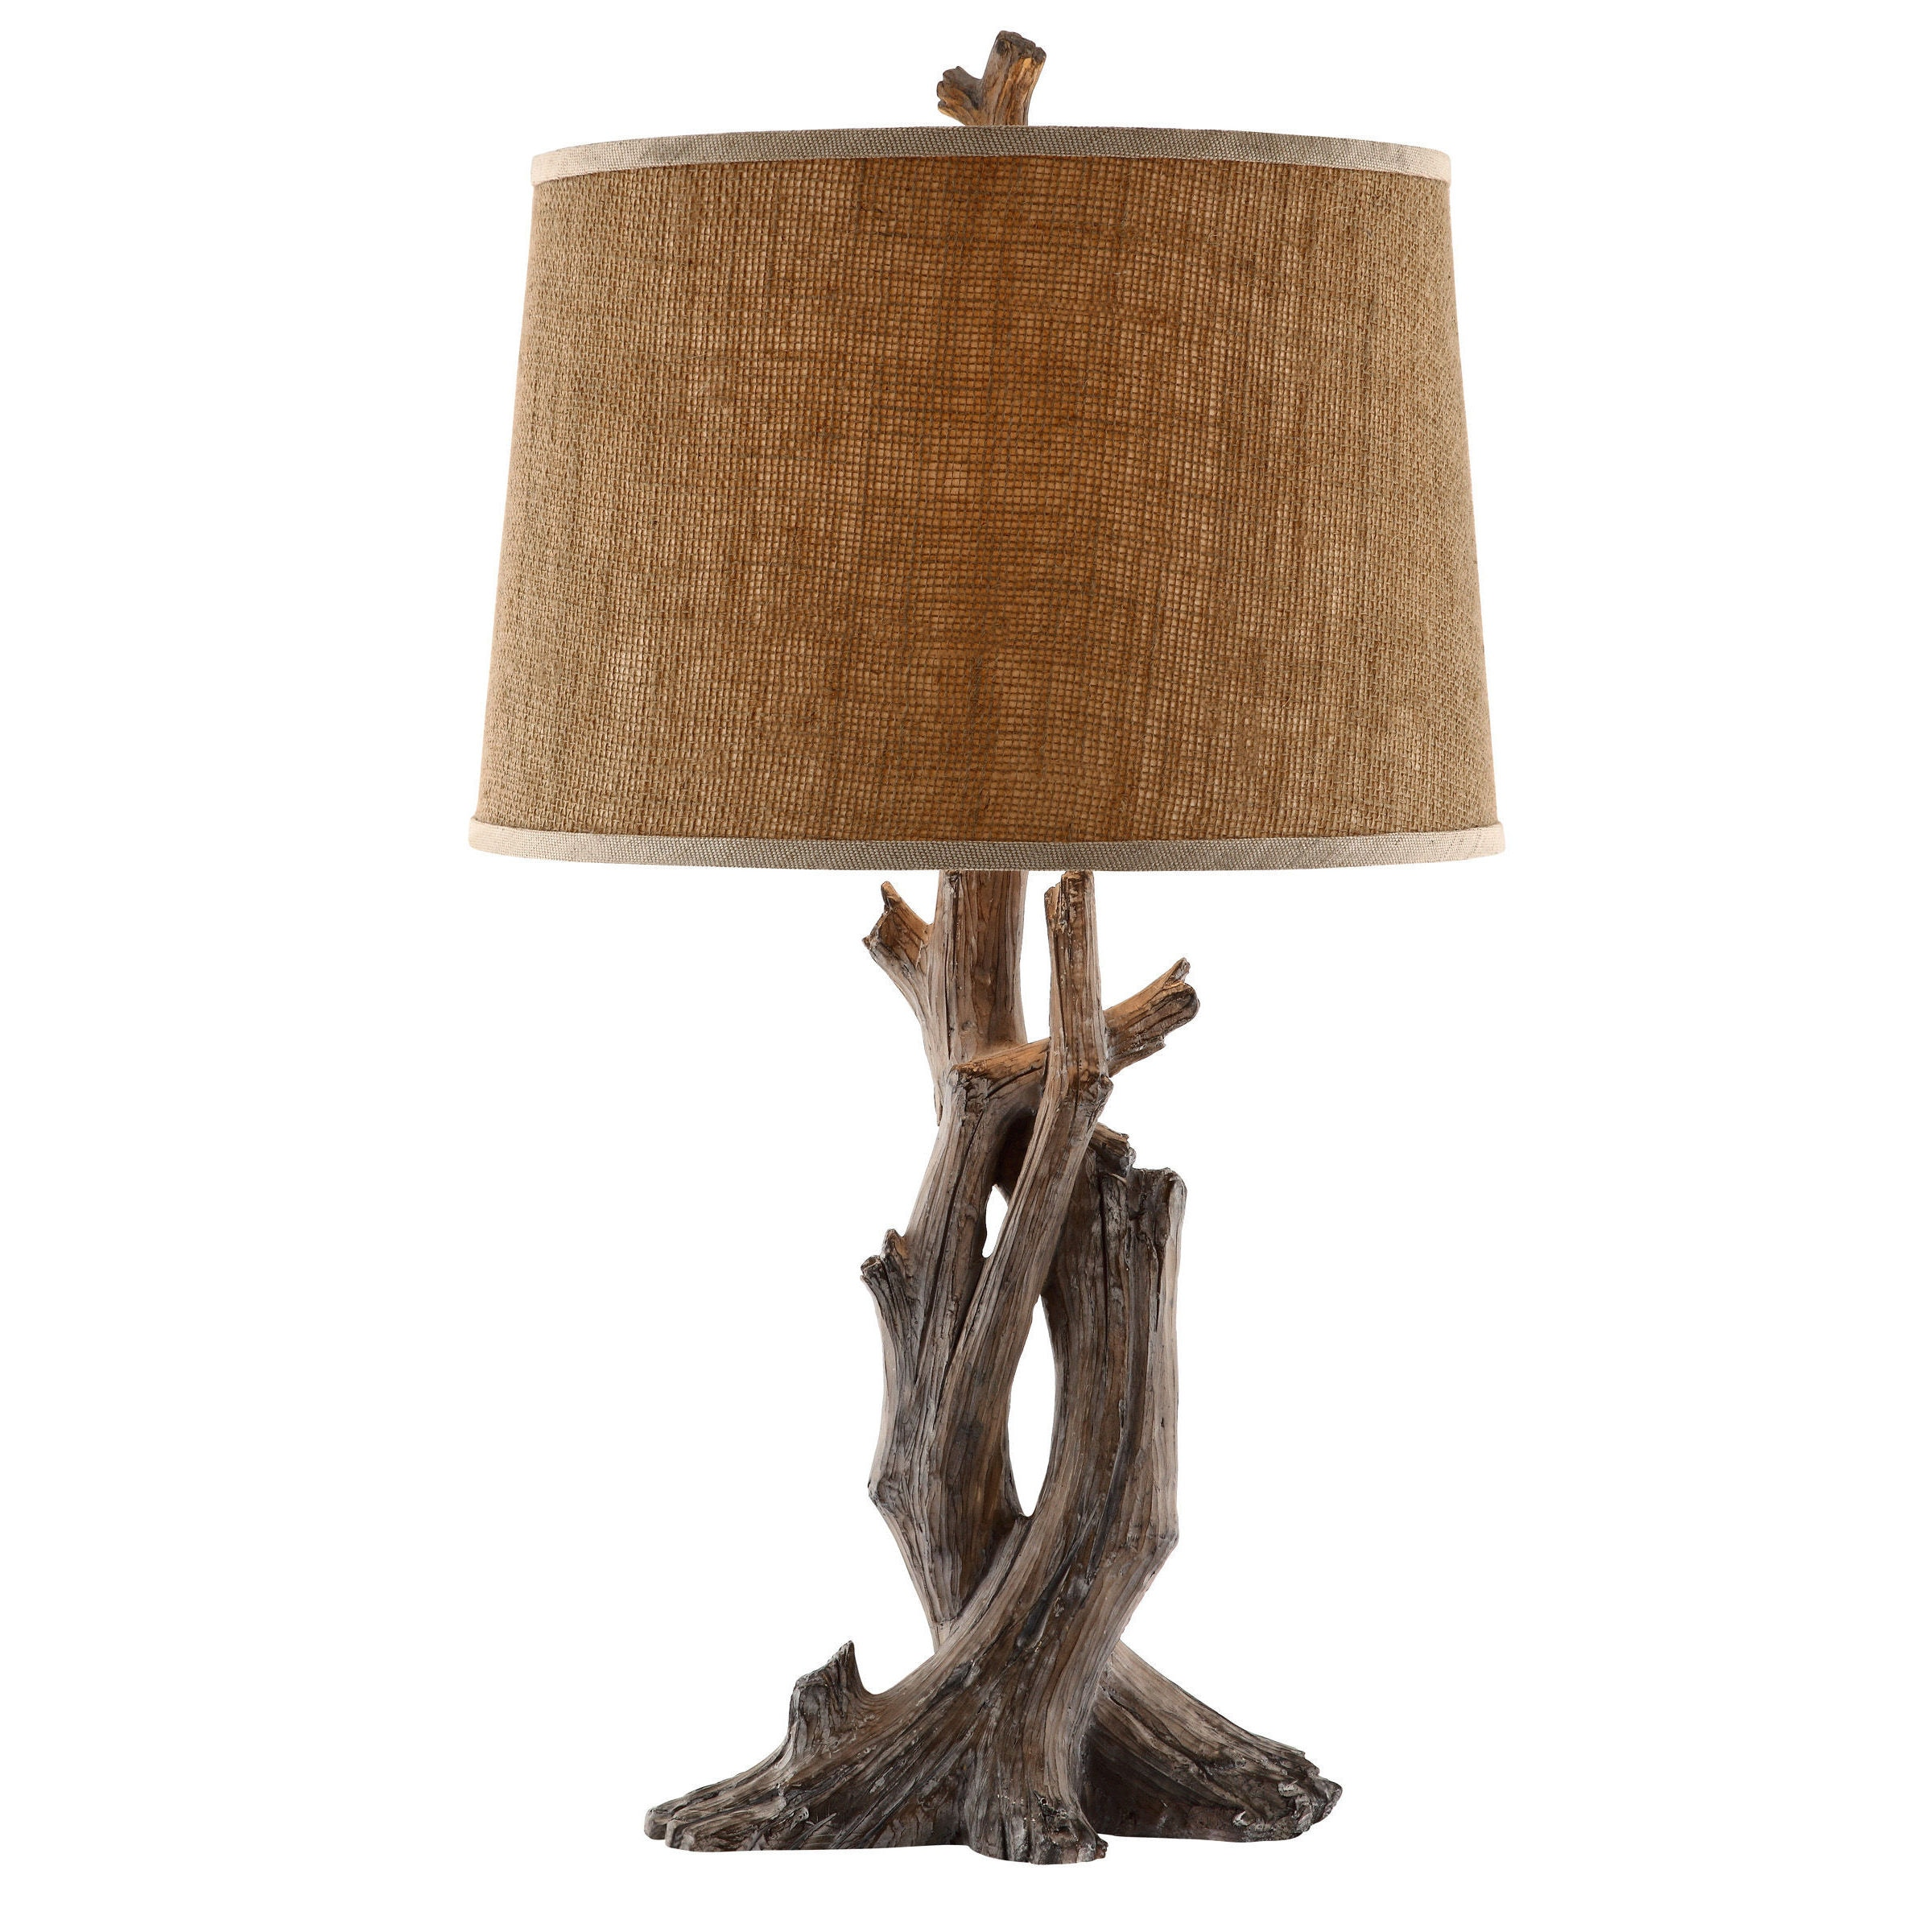 Carbon Loft Watt Resin Natural Wood Table Lamp